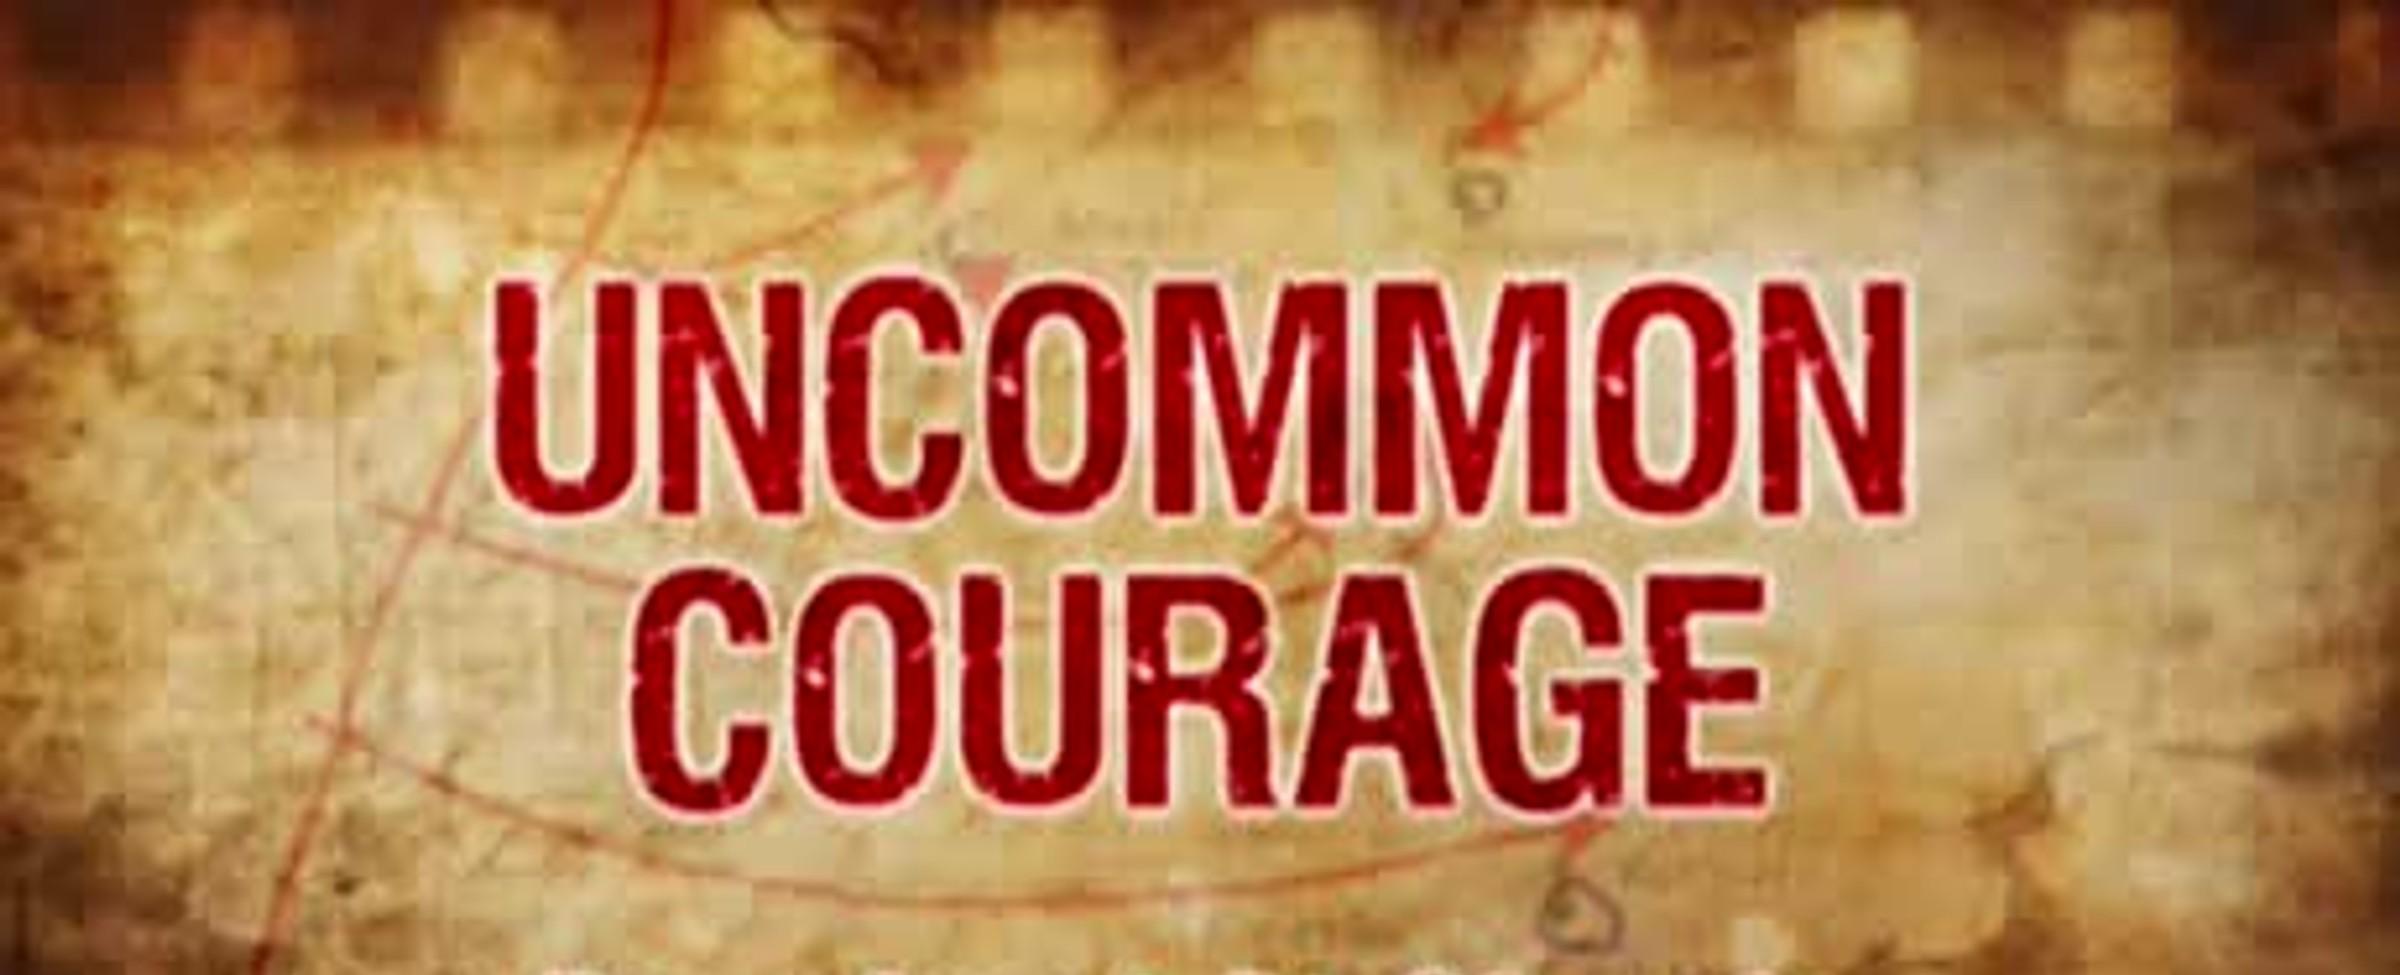 Neobvyklá odvaha